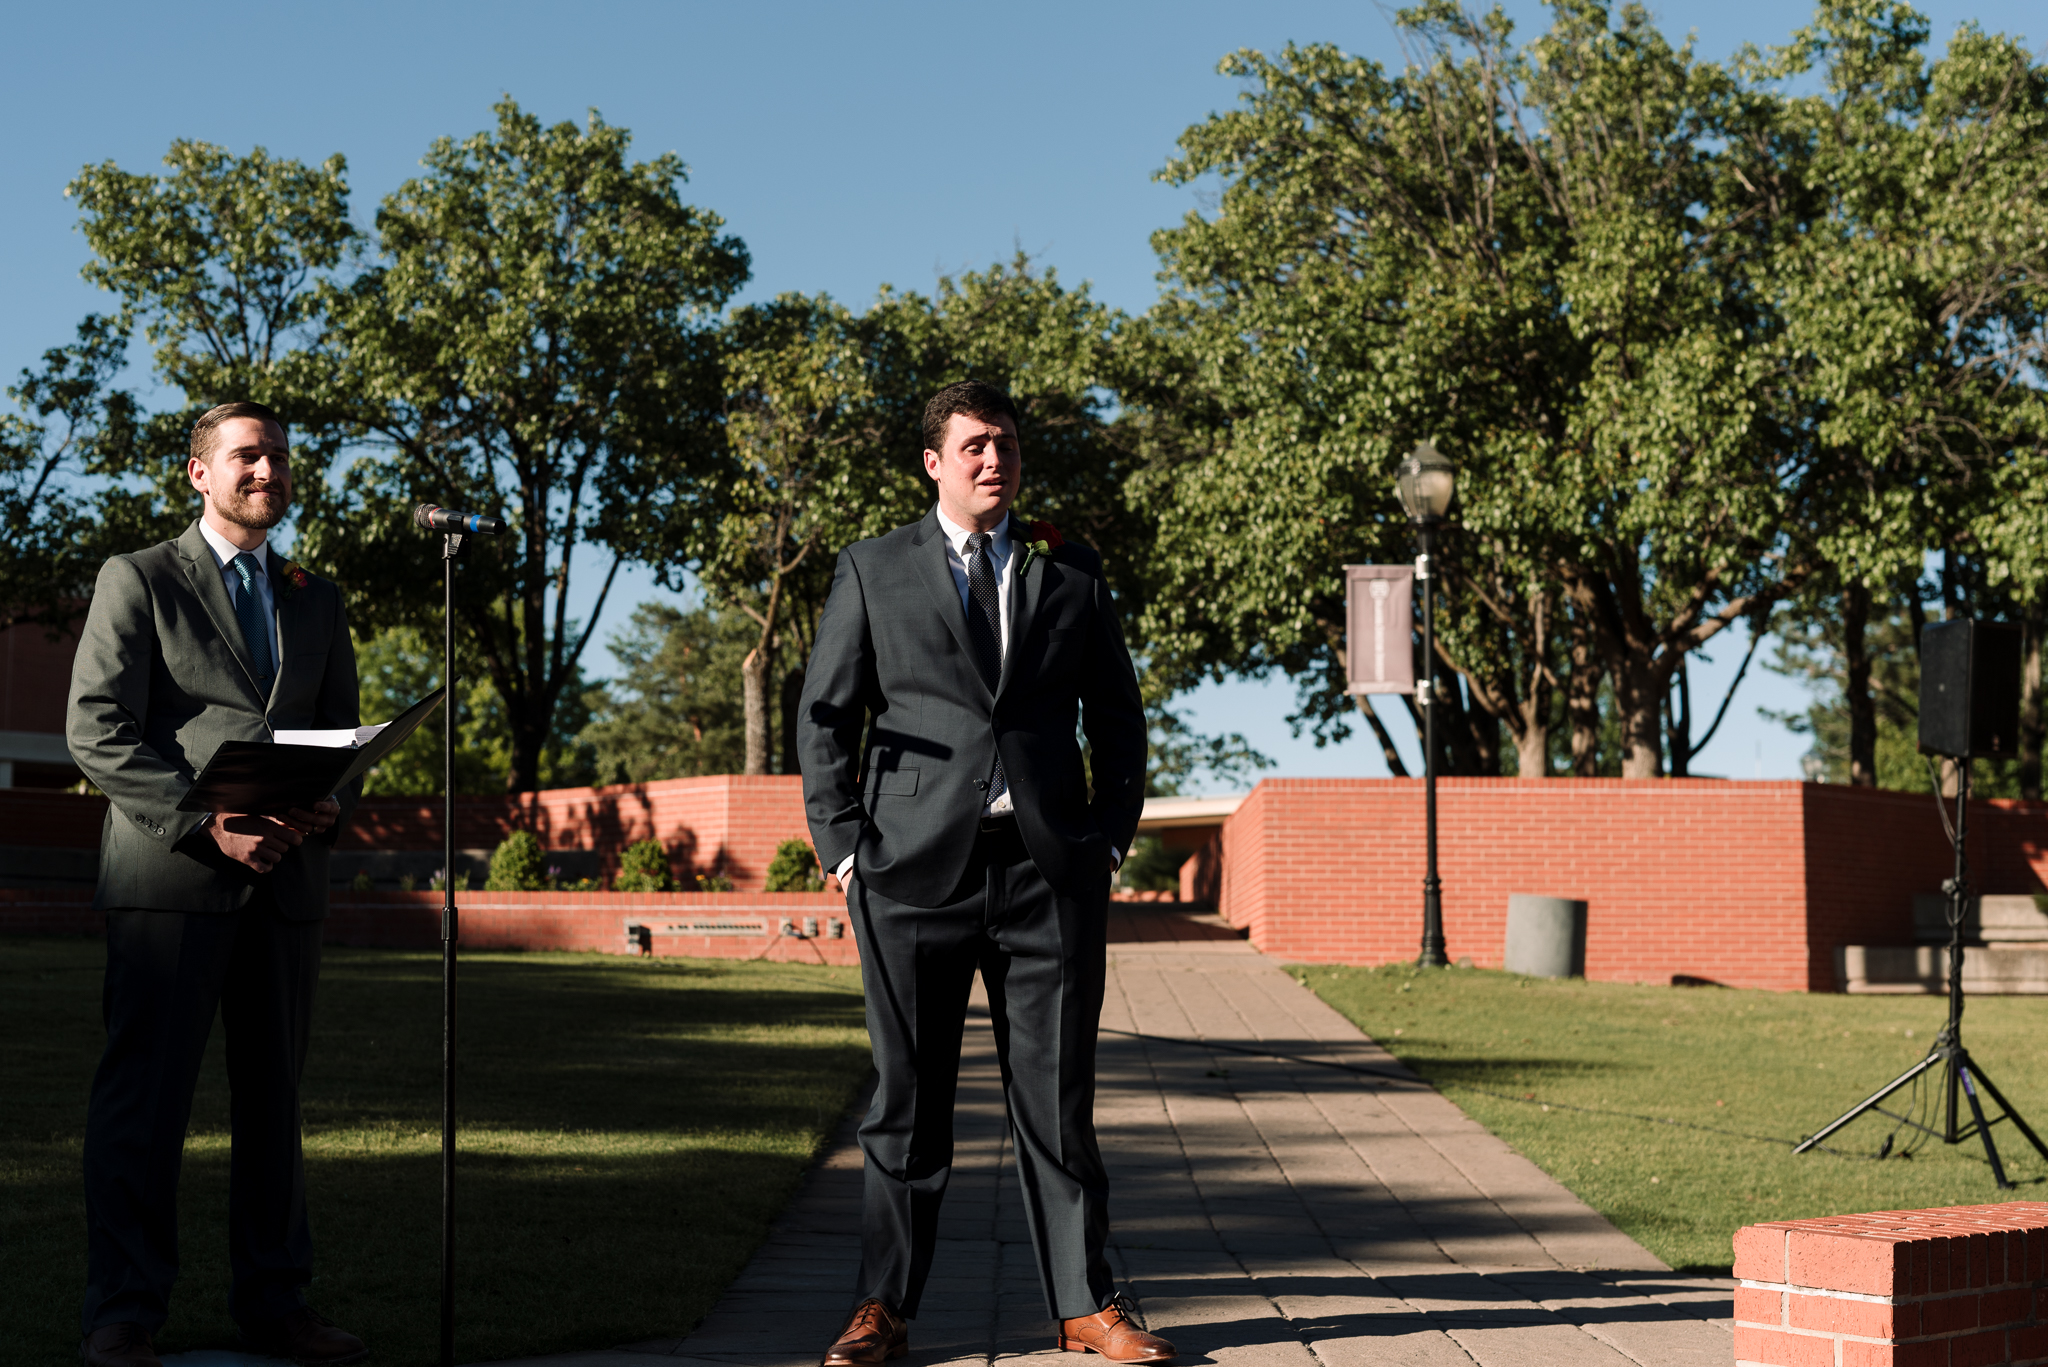 Oklahoma-Christian-University-Wedding-8177.jpg